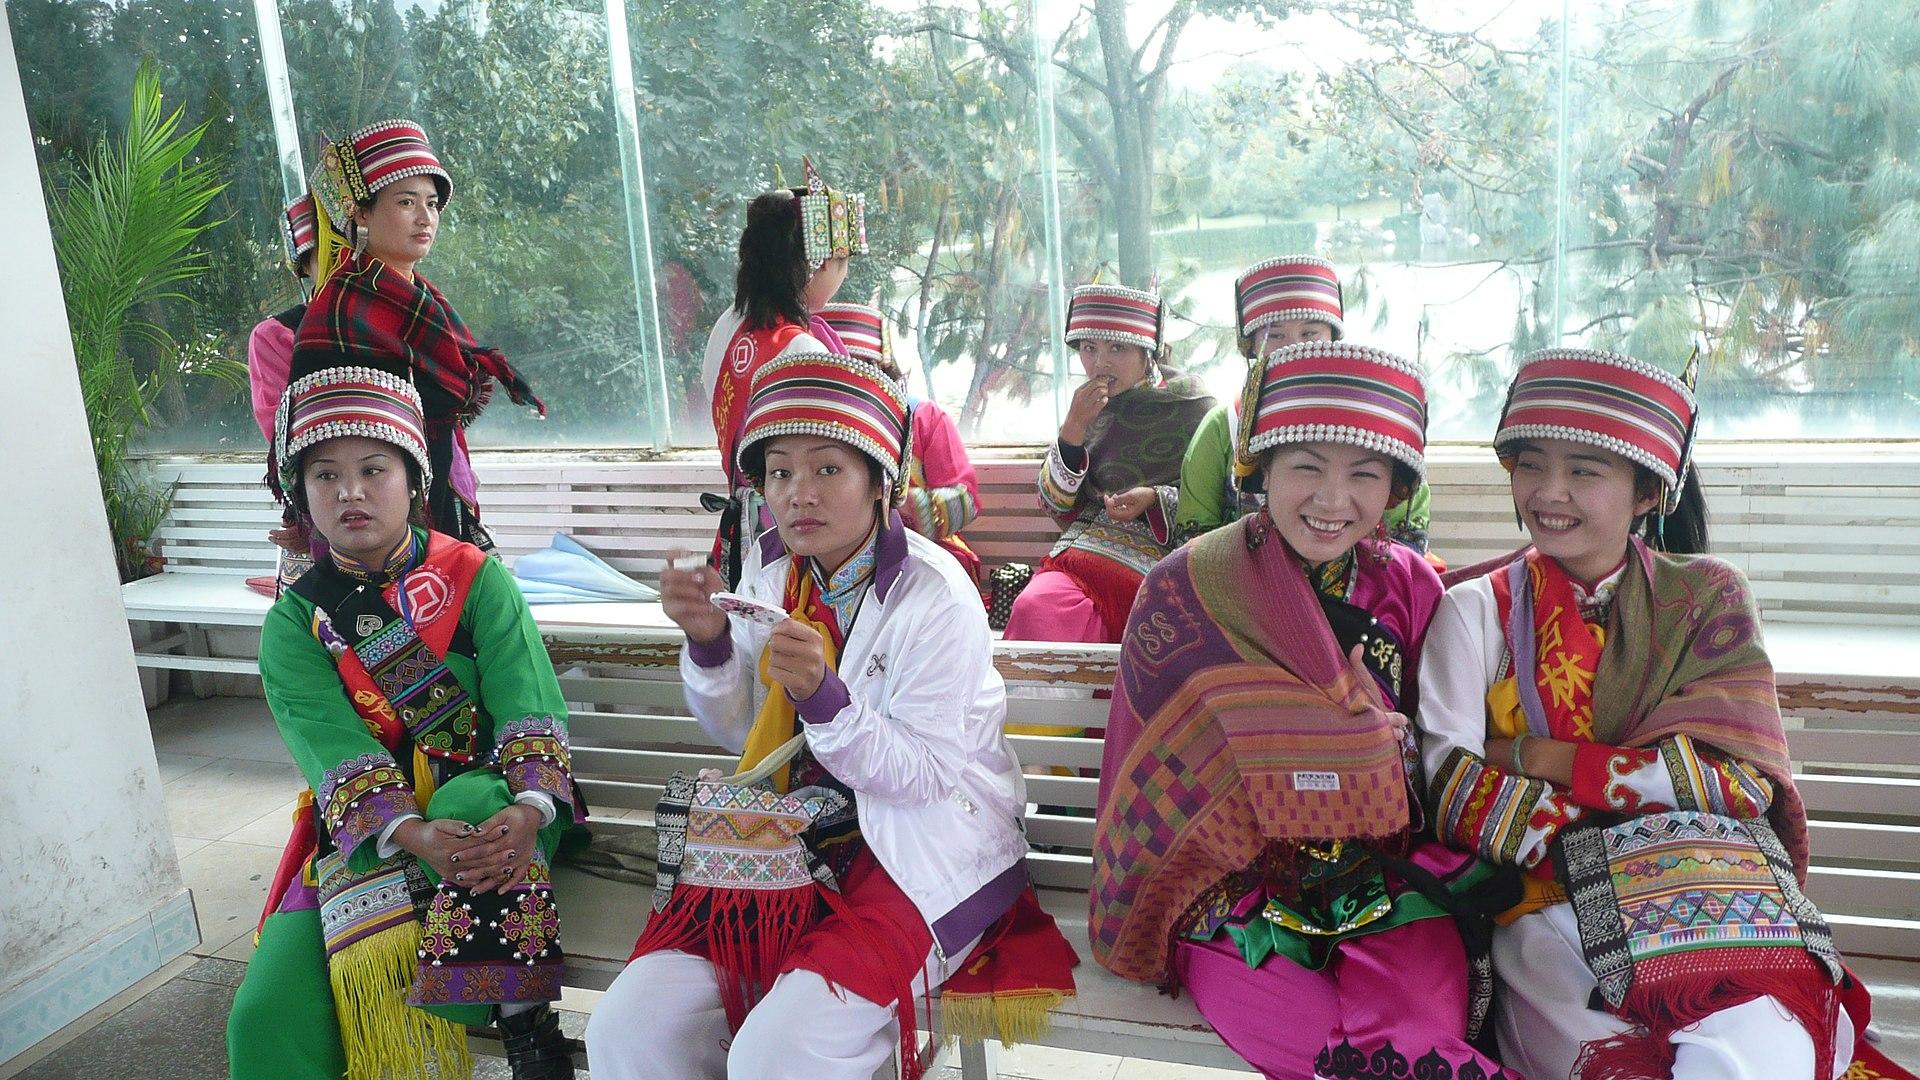 yi minority sichuan grupa wikimedia wikipedia etniczna volk indigenous peoples commons sani shilin kunming wiki